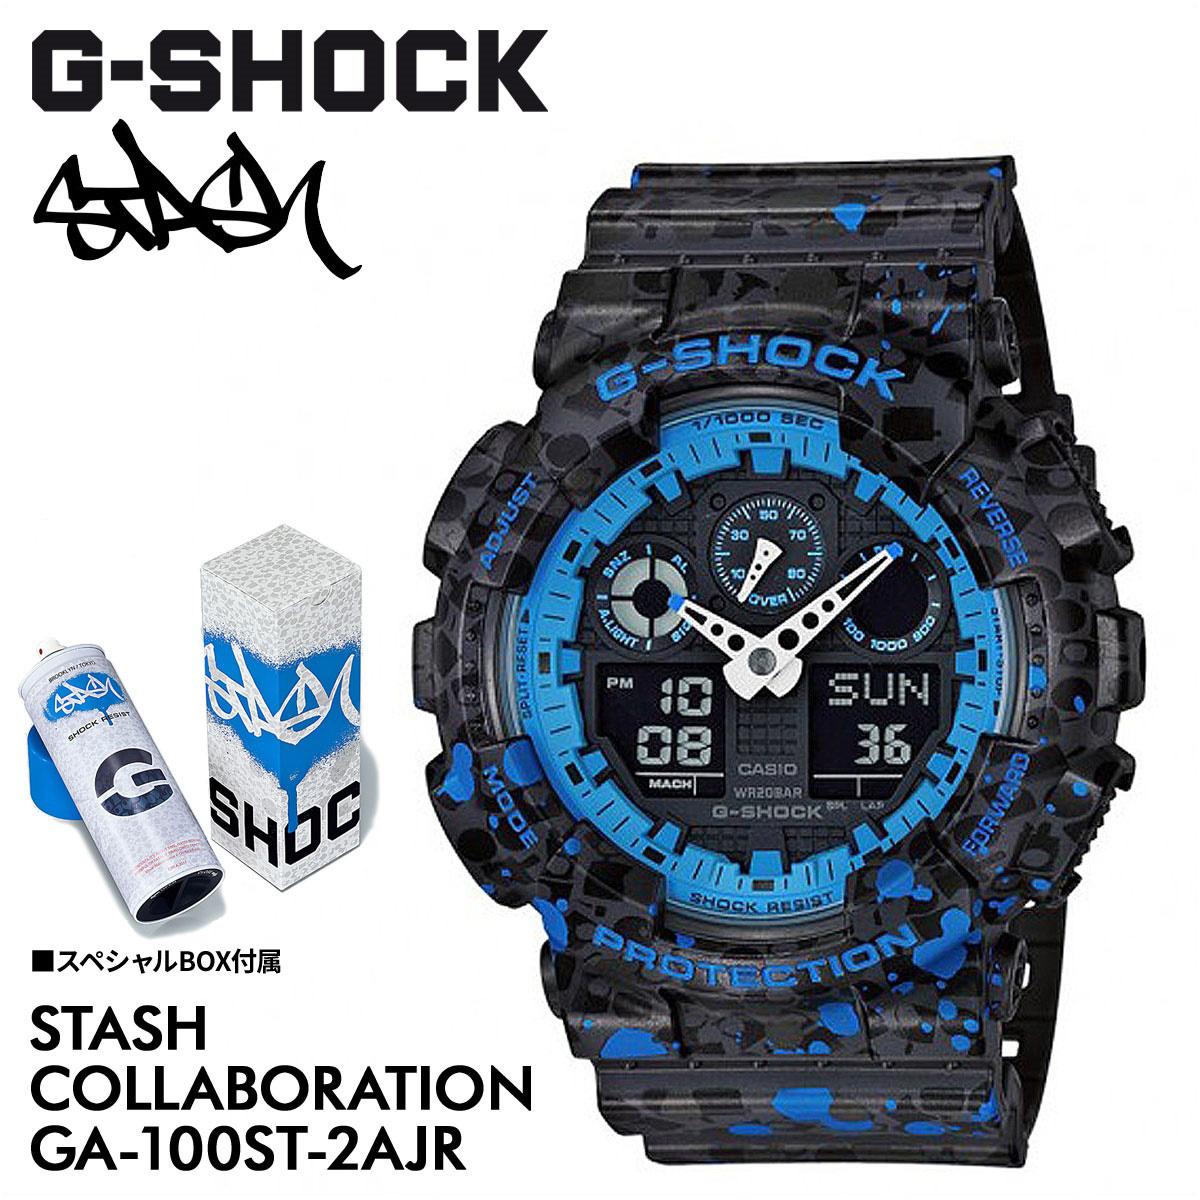 CASIO カシオ G-SHOCK 腕時計 GA-100ST-2AJR STASH コラボ ジーショック Gショック G-ショック ブラック 黒 時計 メンズ 防水